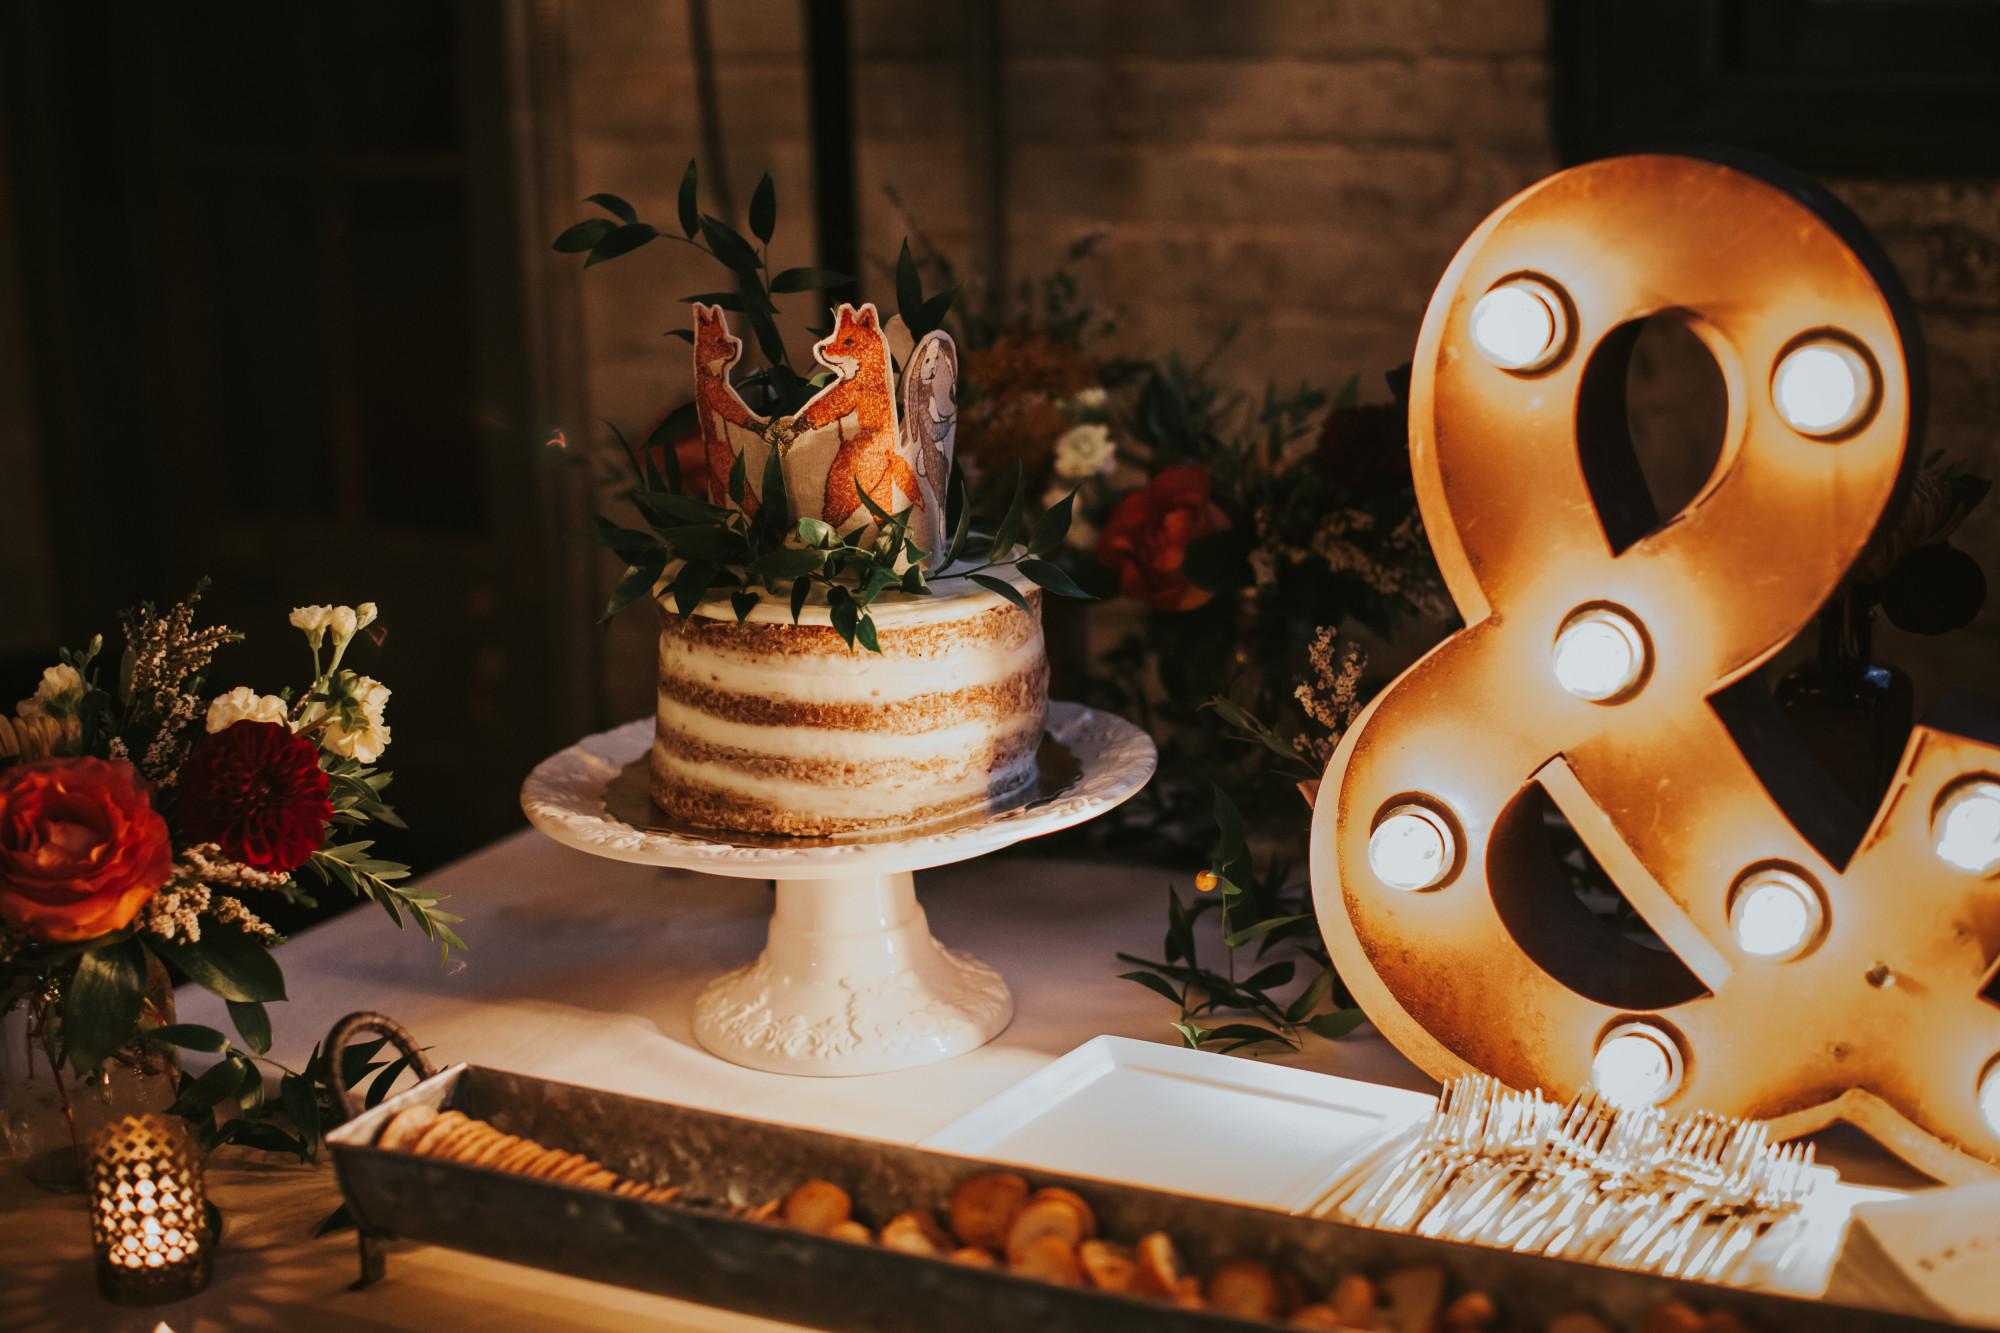 Beth-Ted-Balzacs-Coffee-Distillery-District-Toronto-Wedding-Planning-INLY-Events-Lushana-Bale-Photography-0302.jpg